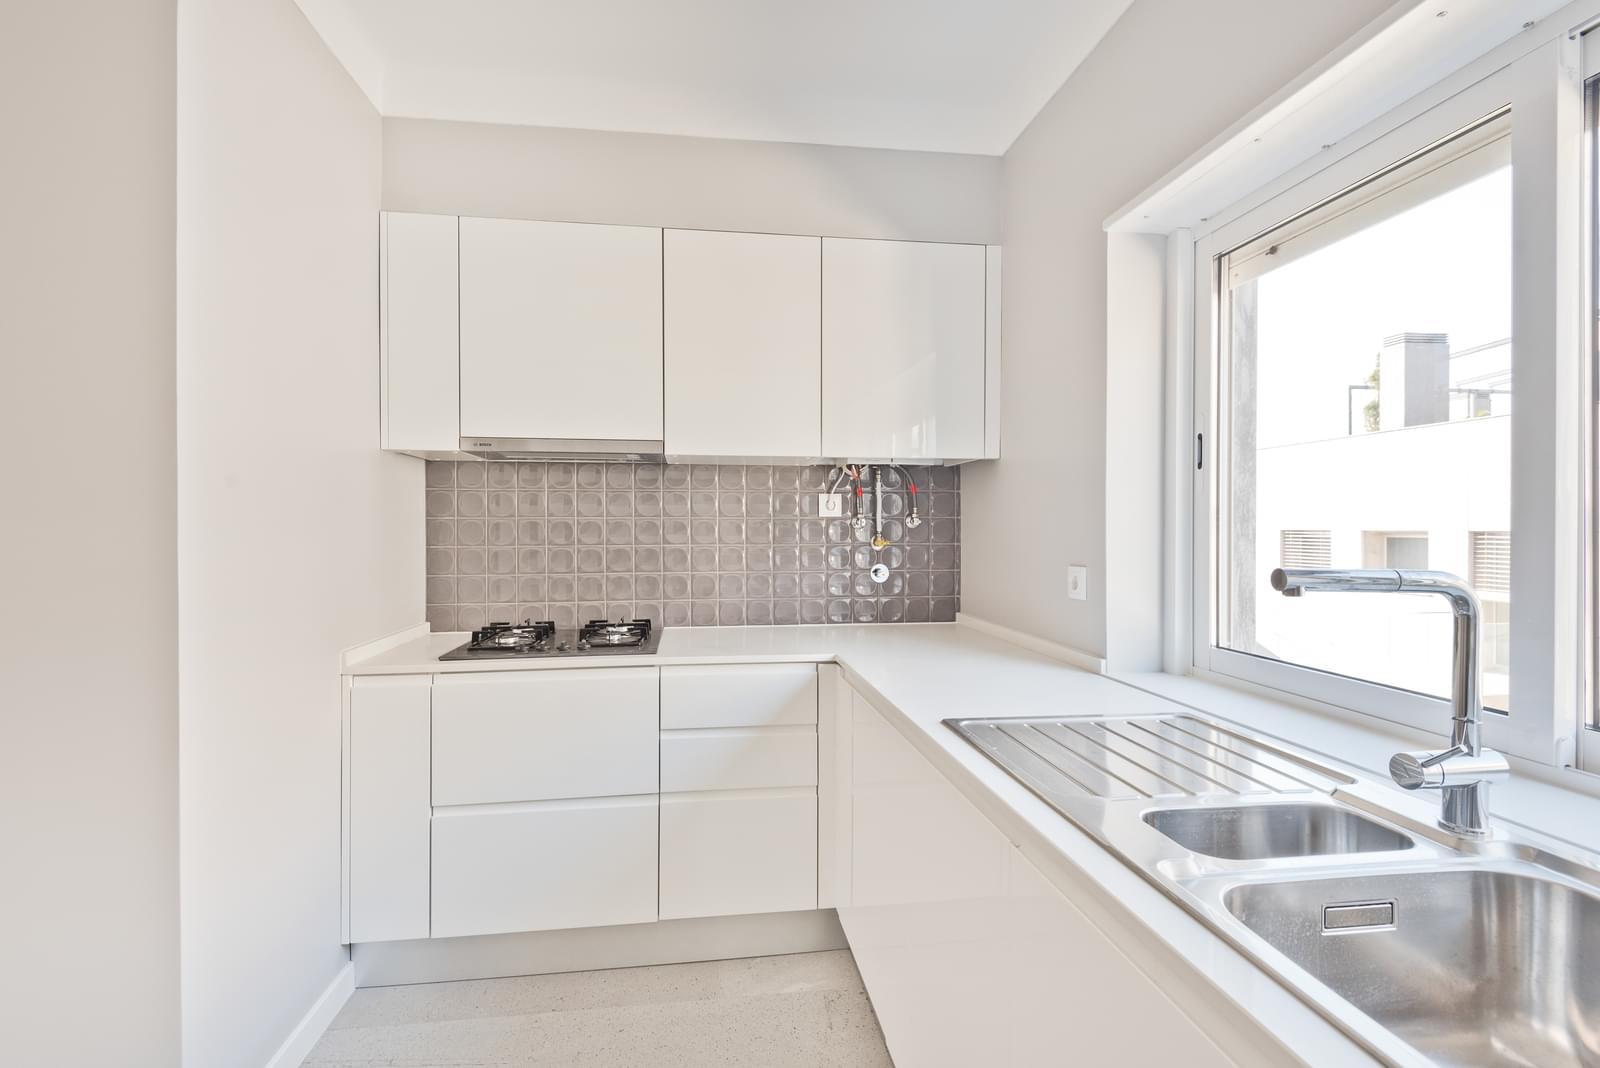 pf18954-apartamento-t3-cascais-aea1aa8c-e291-4fe8-92c8-291601492a3d